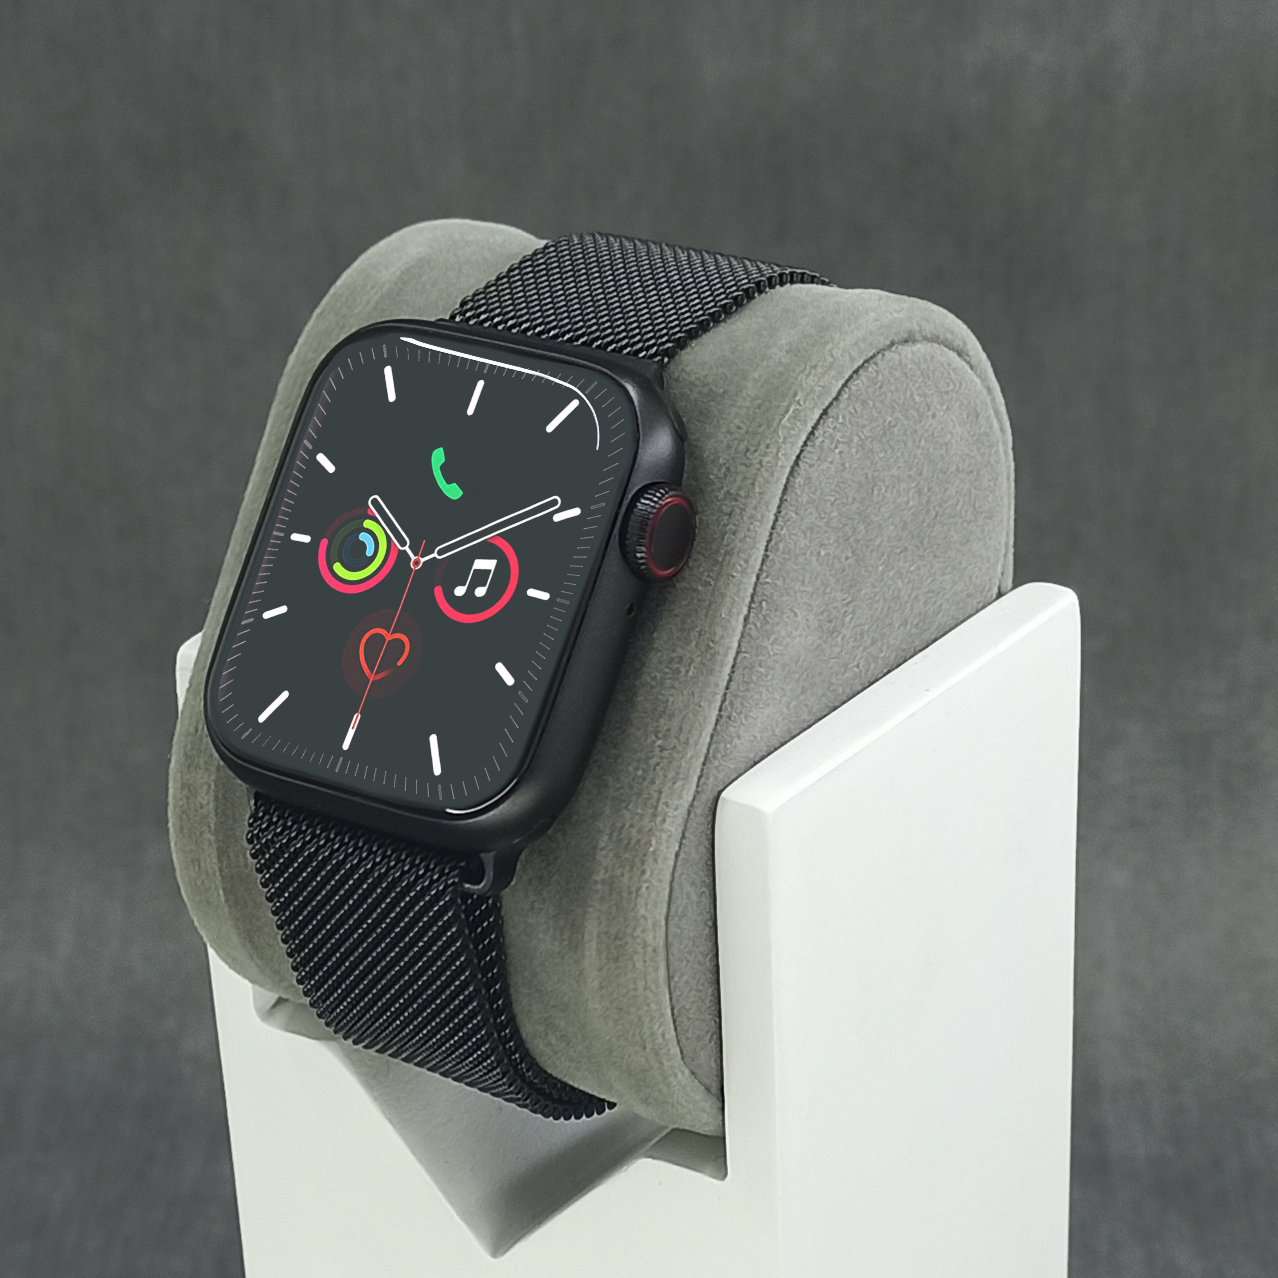 ساعت هوشمند گیفت کالکشن مدل Watch6-LE Milanese 40mm